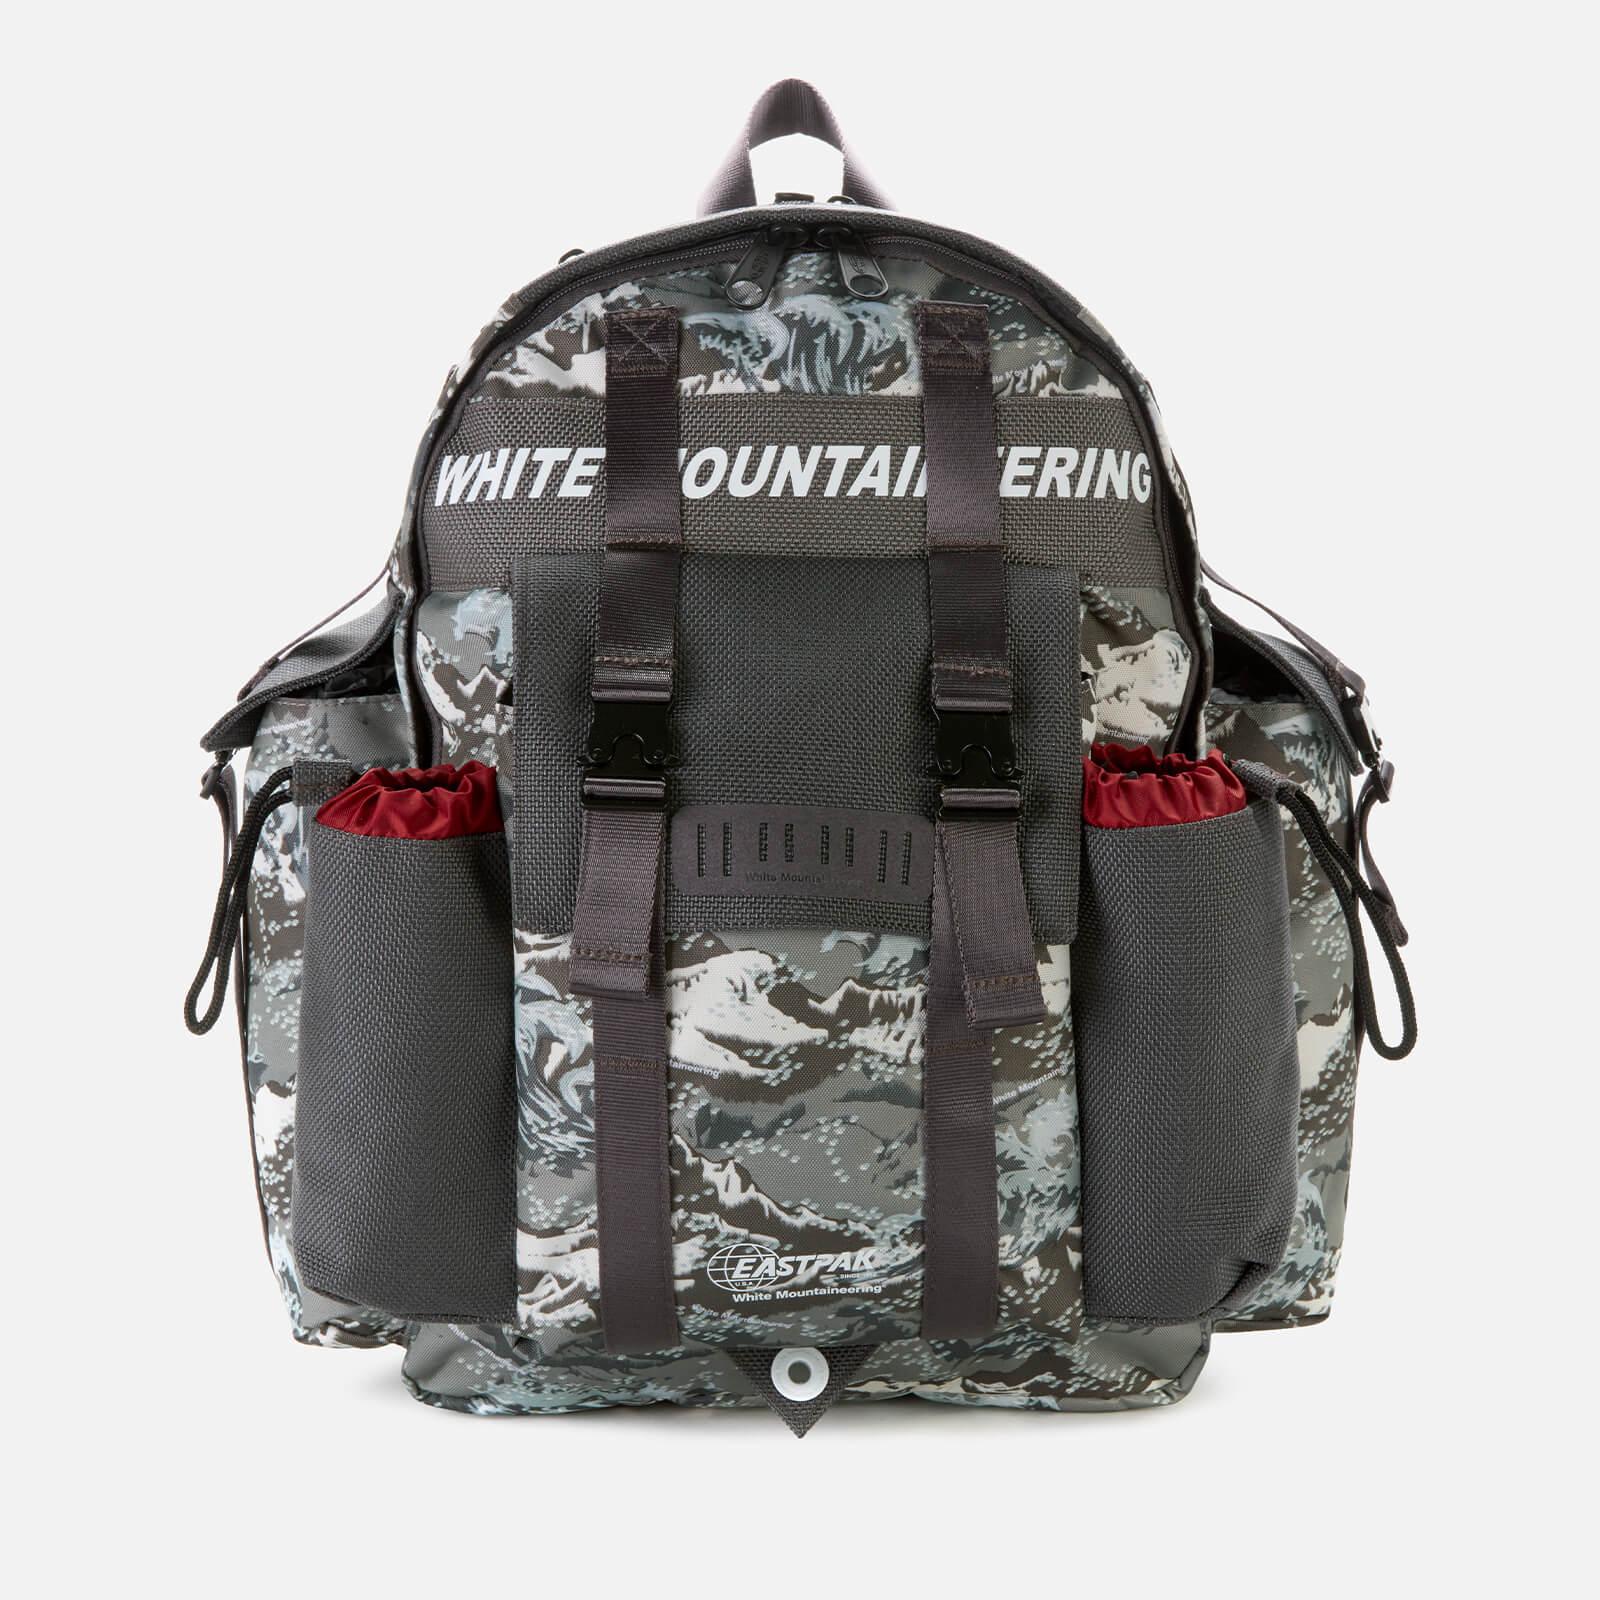 de beste aankomen goed uit x Eastpak X White Mountaineering Men's Pak'r Backpack - WM Mountain